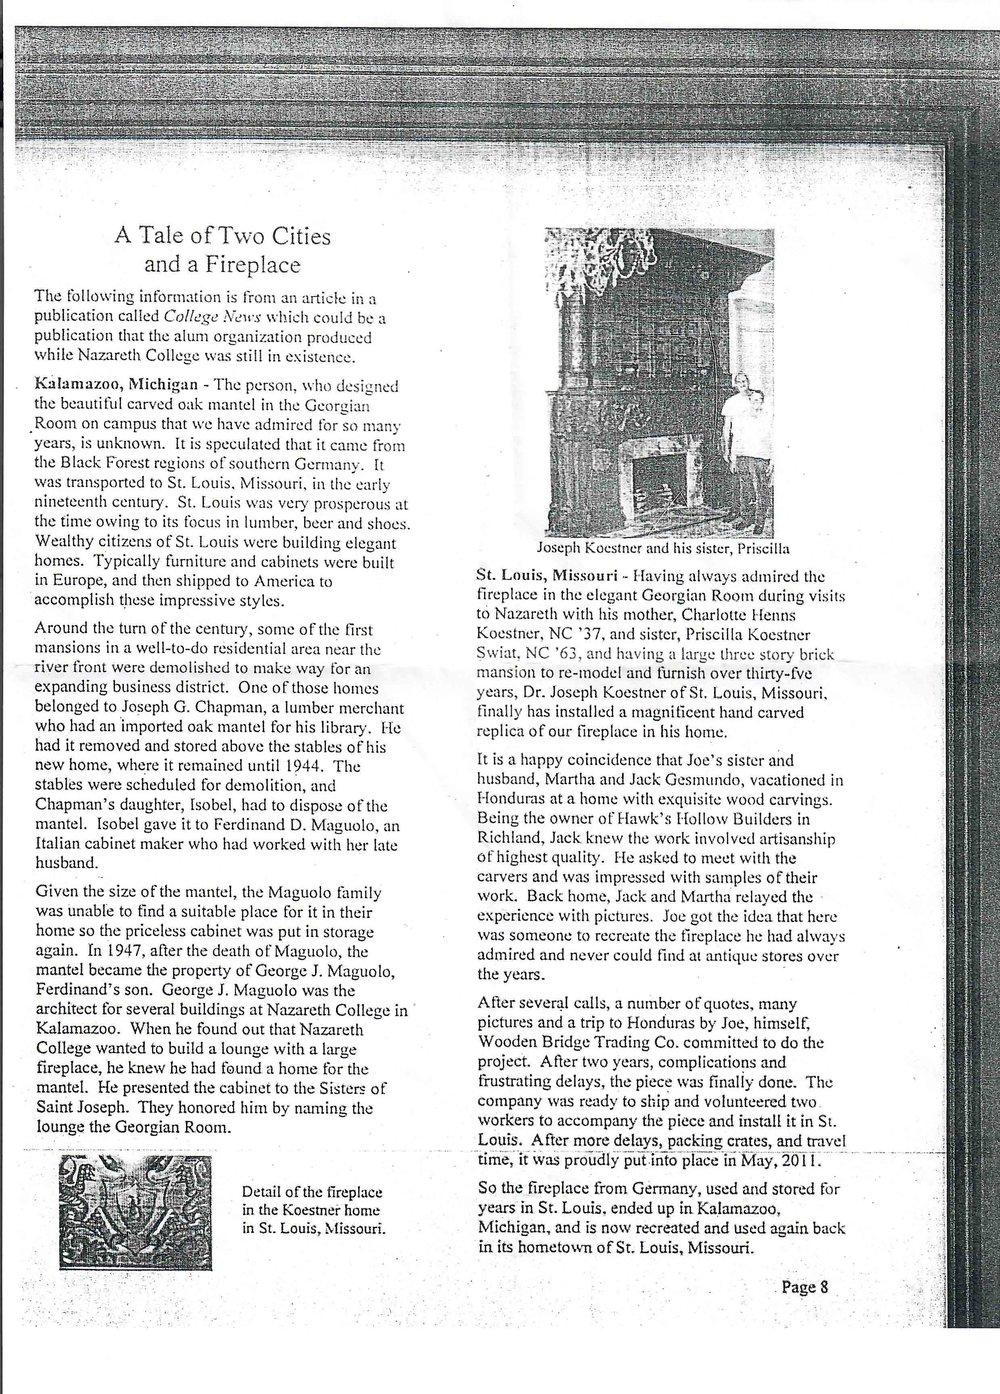 Fireplace article.jpg